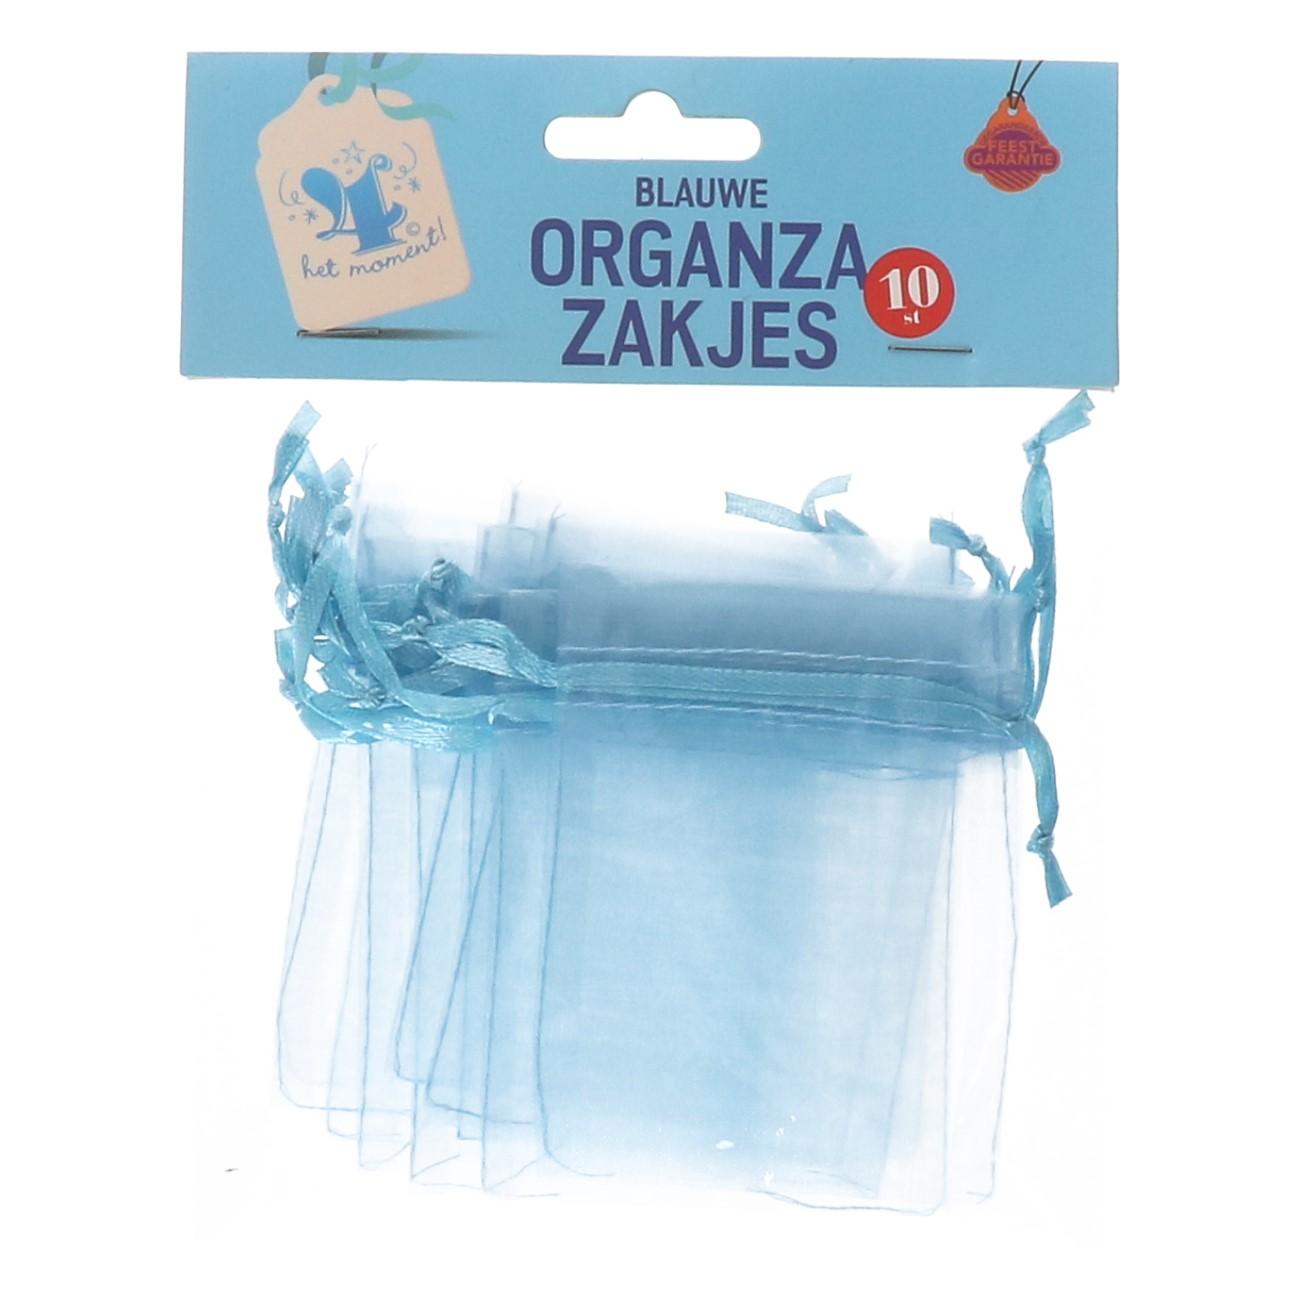 Organza zakjes blauw 10 stuks